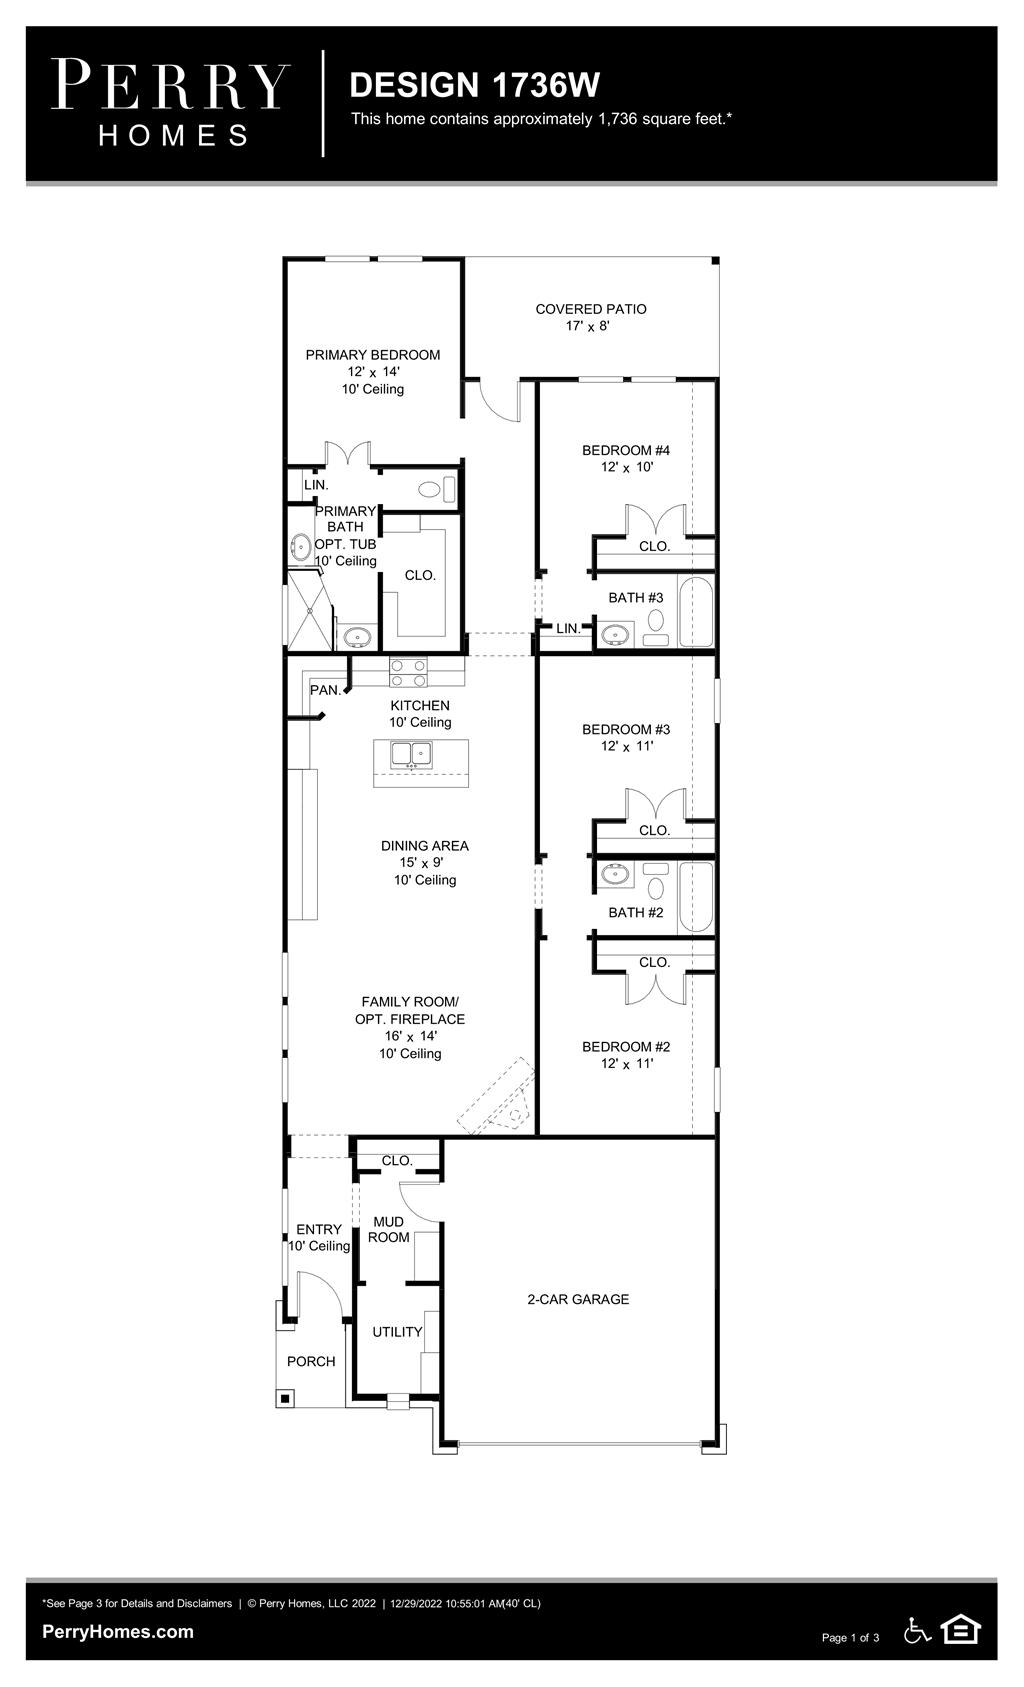 Floor Plan for 1736W